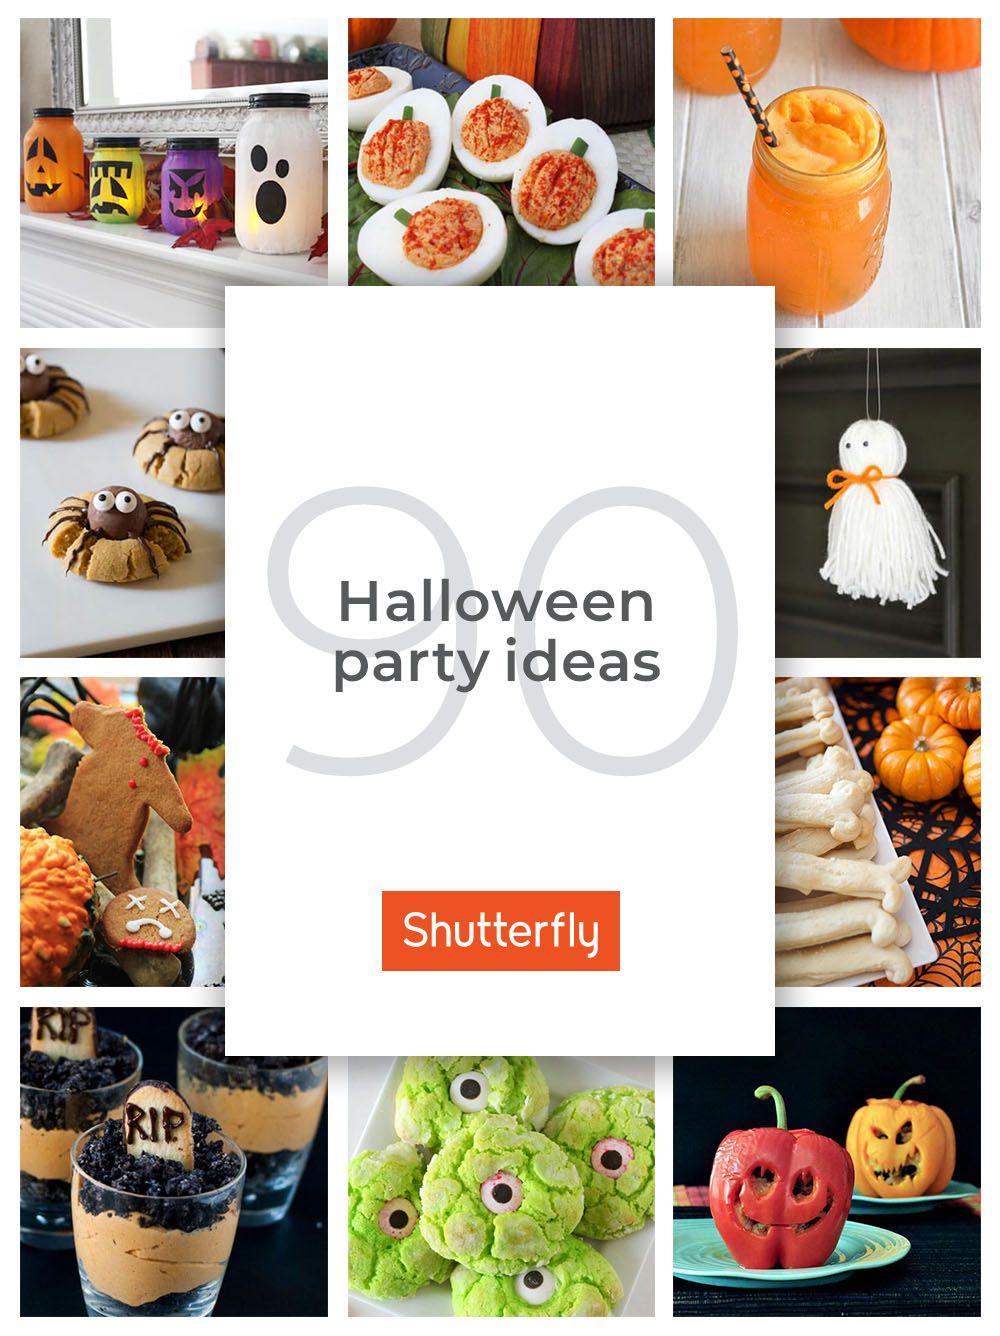 How To Make A Halloween Party Fun.90 Fun Halloween Party Ideas Shutterfly Halloween Party Fun Halloween Party Halloween Party Craft